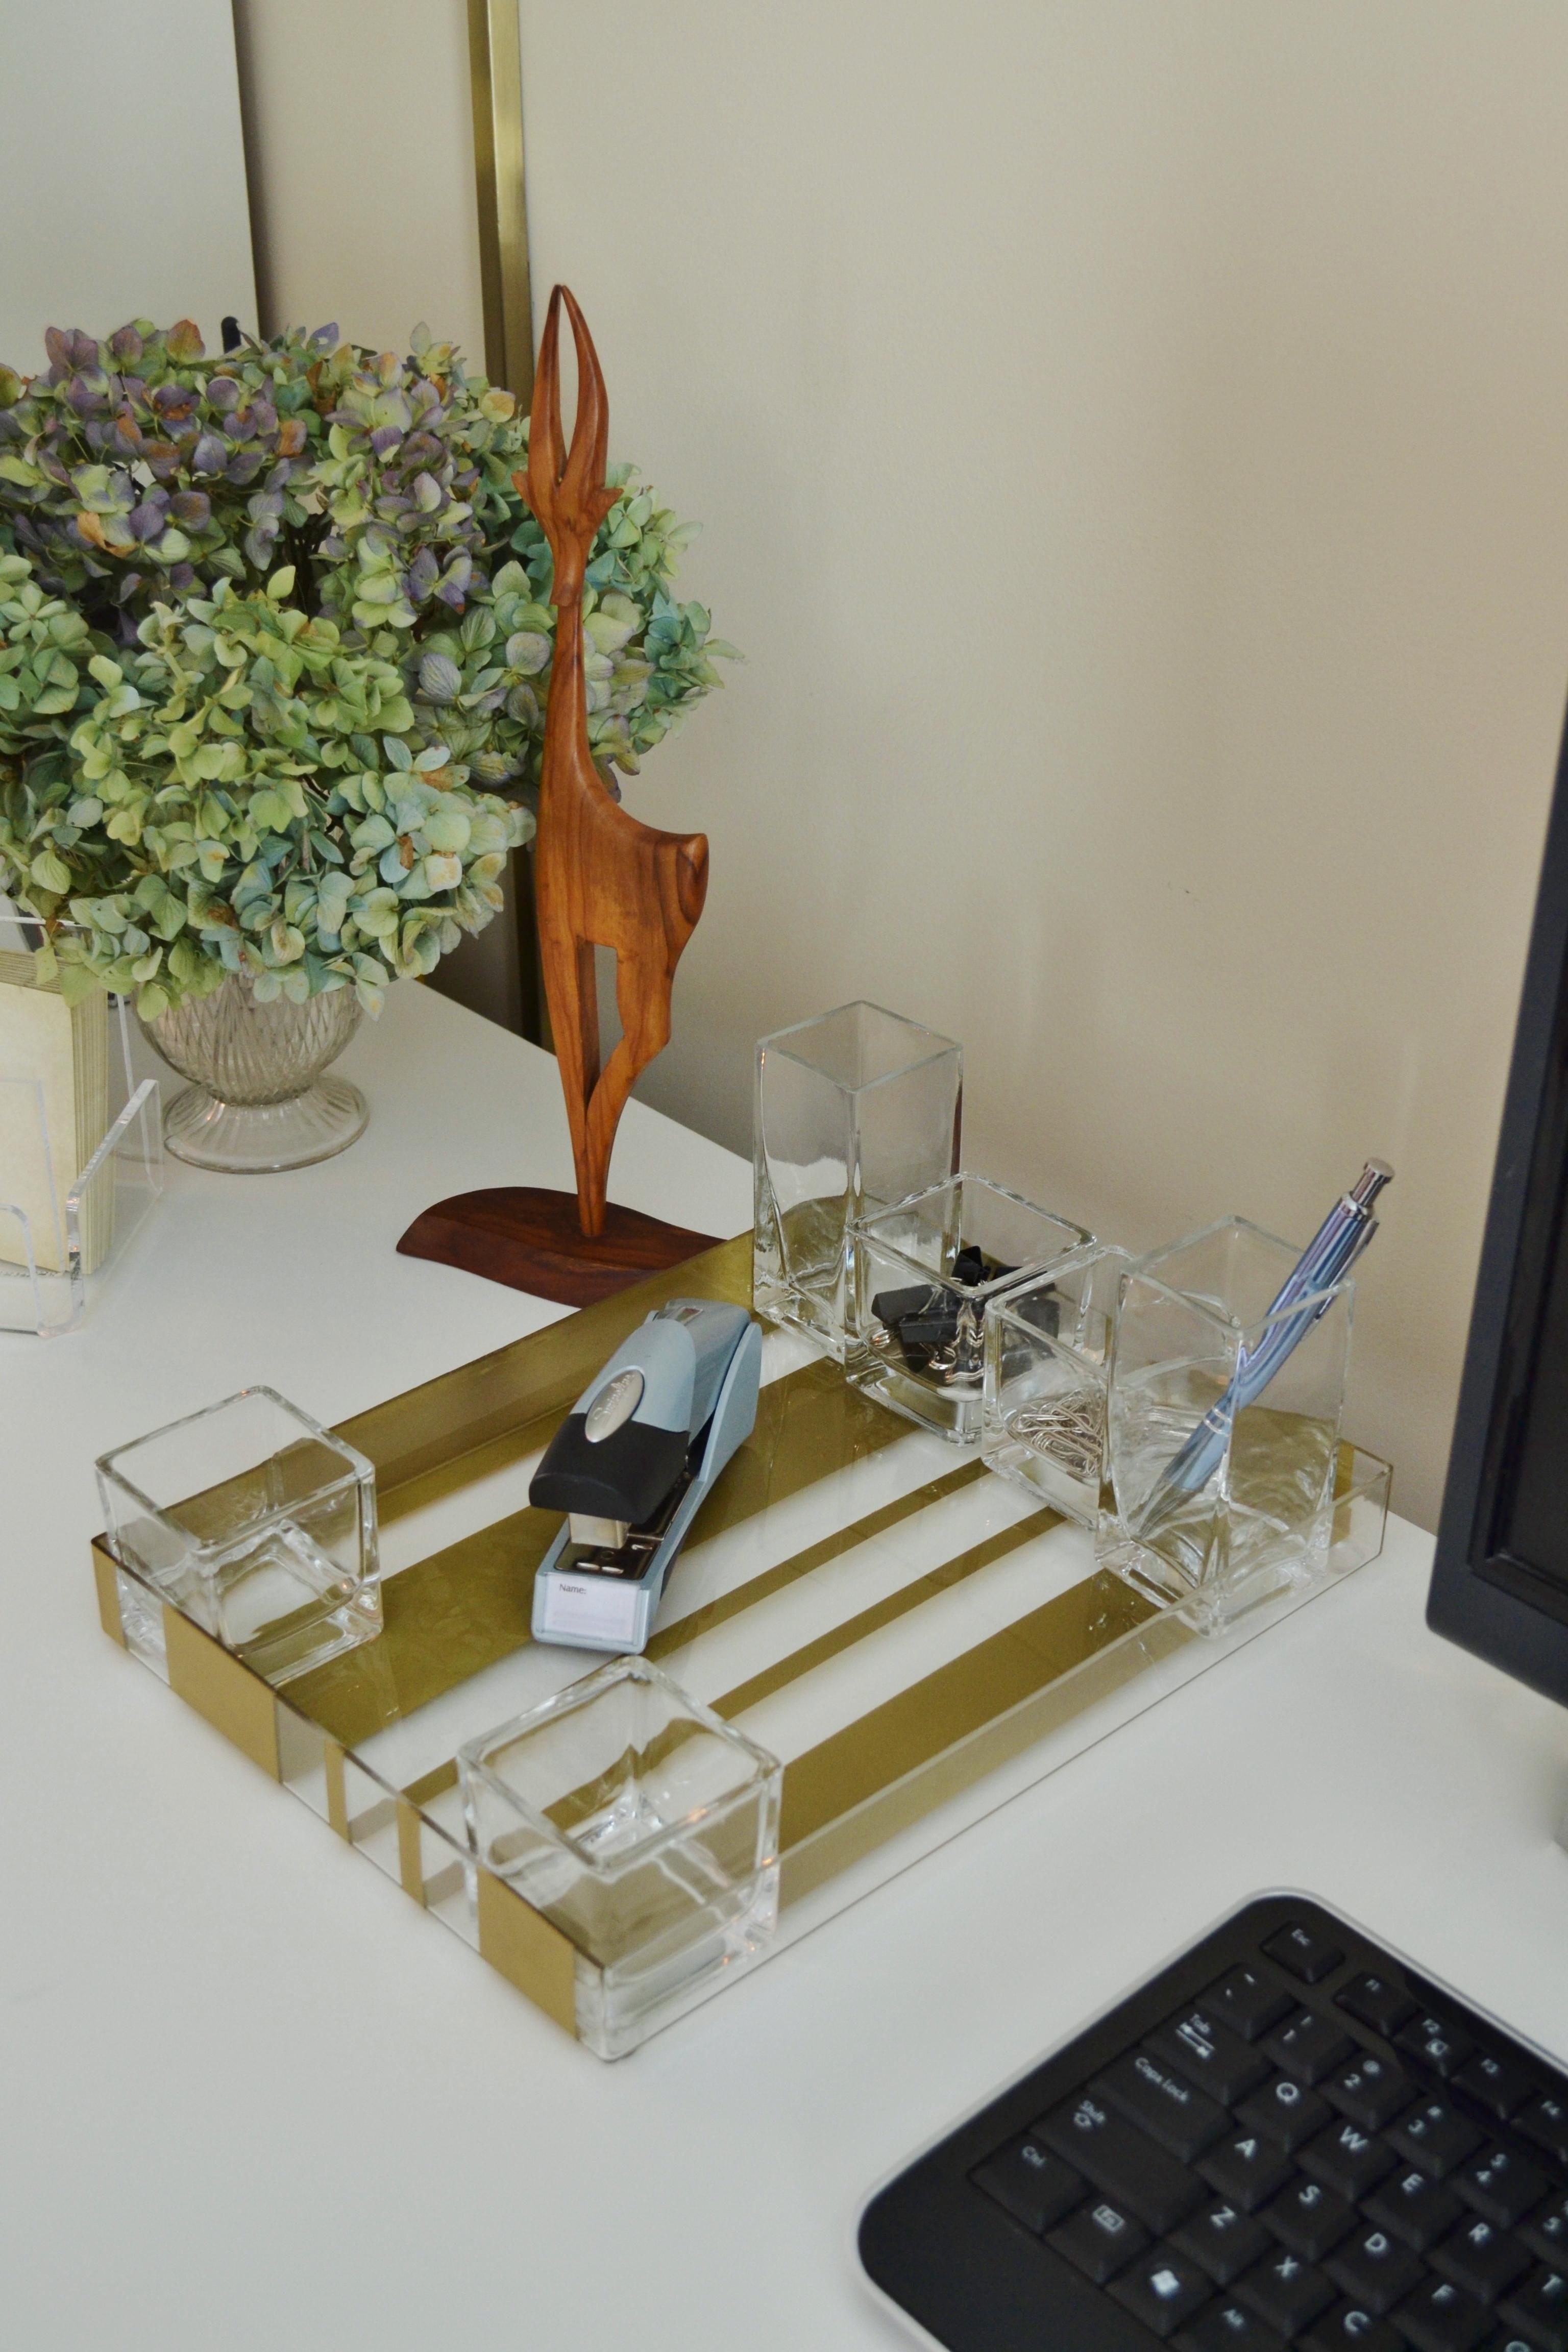 diy acrylic desk organizer